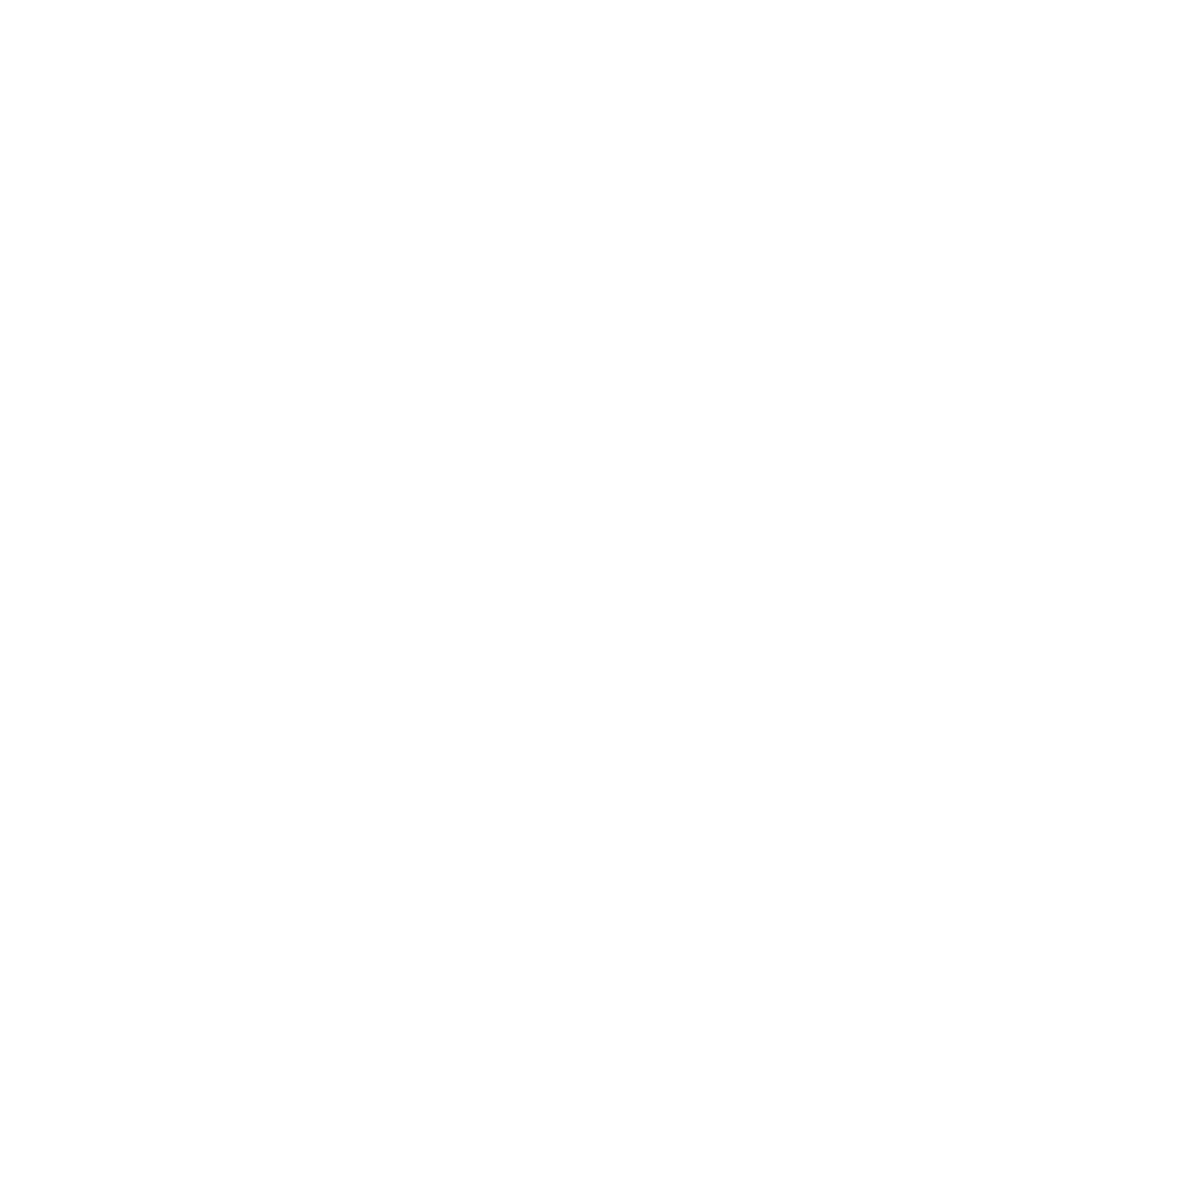 personal-statement-help